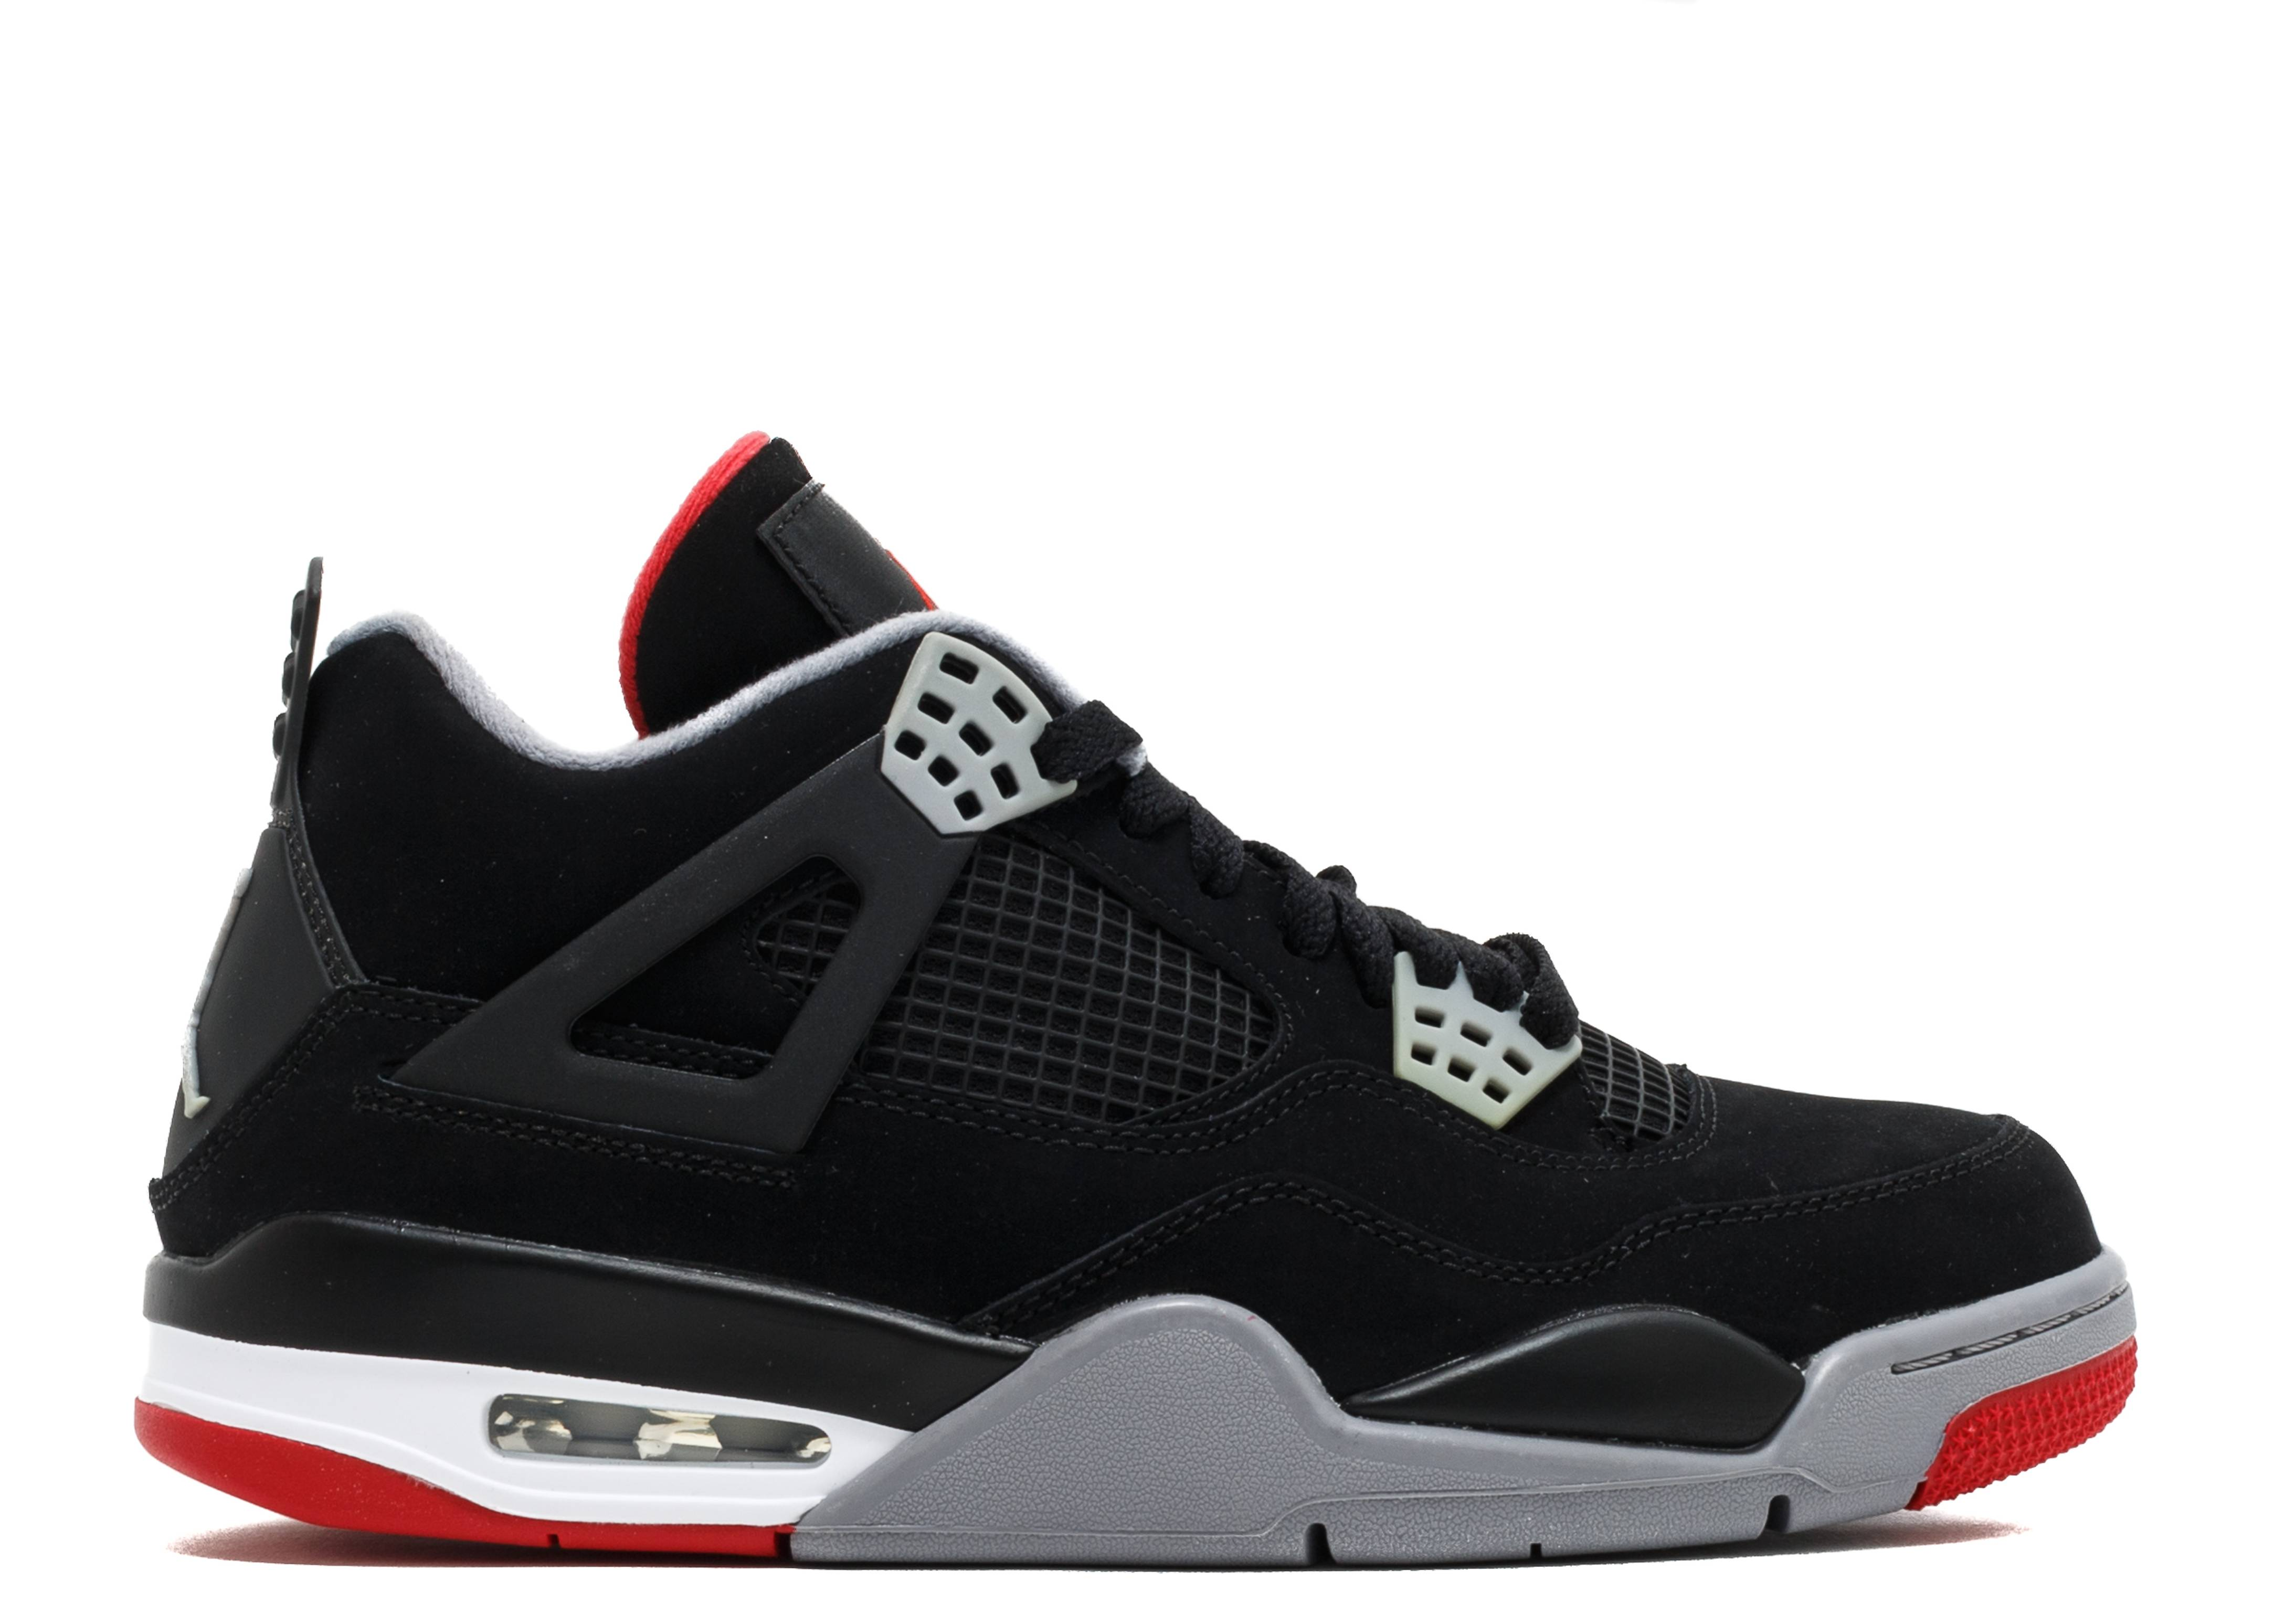 Air Jordans 4